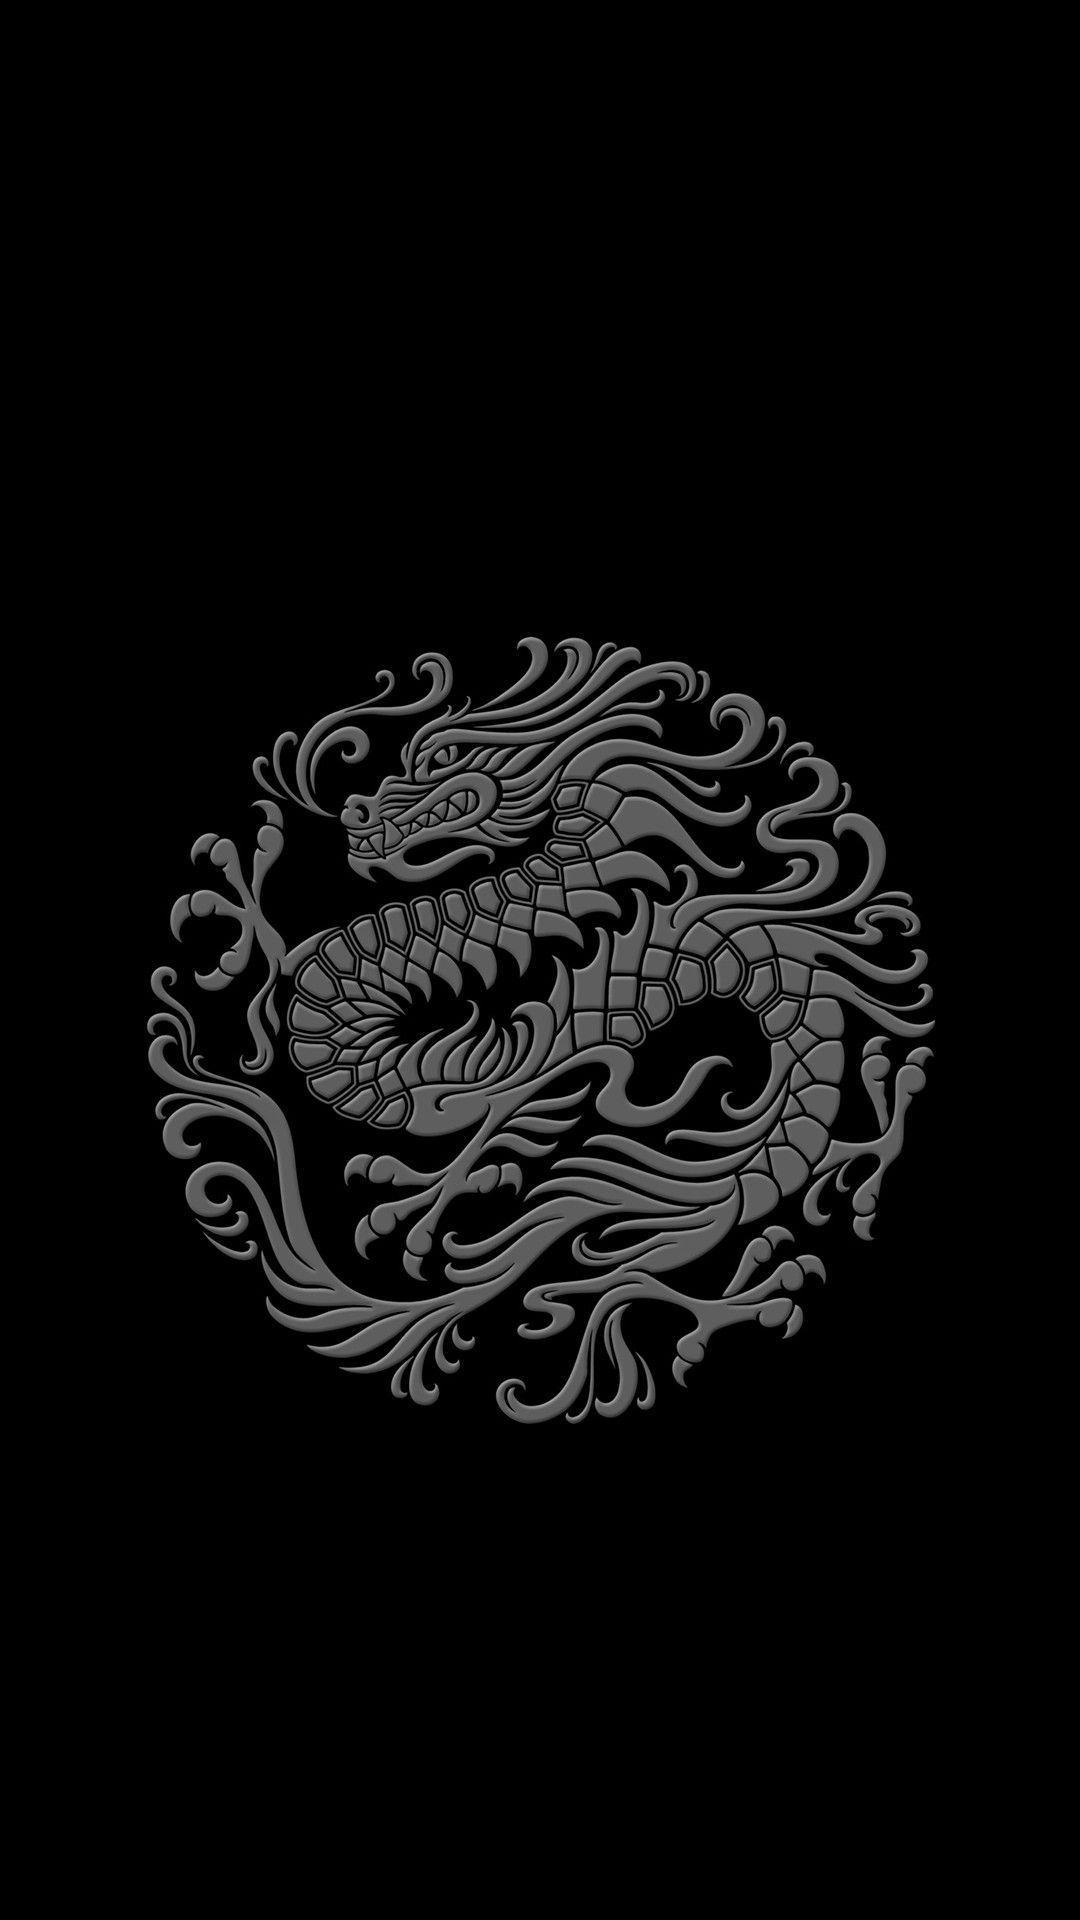 Chinese Dark Dragon Wallpapers Wallpaper Cave